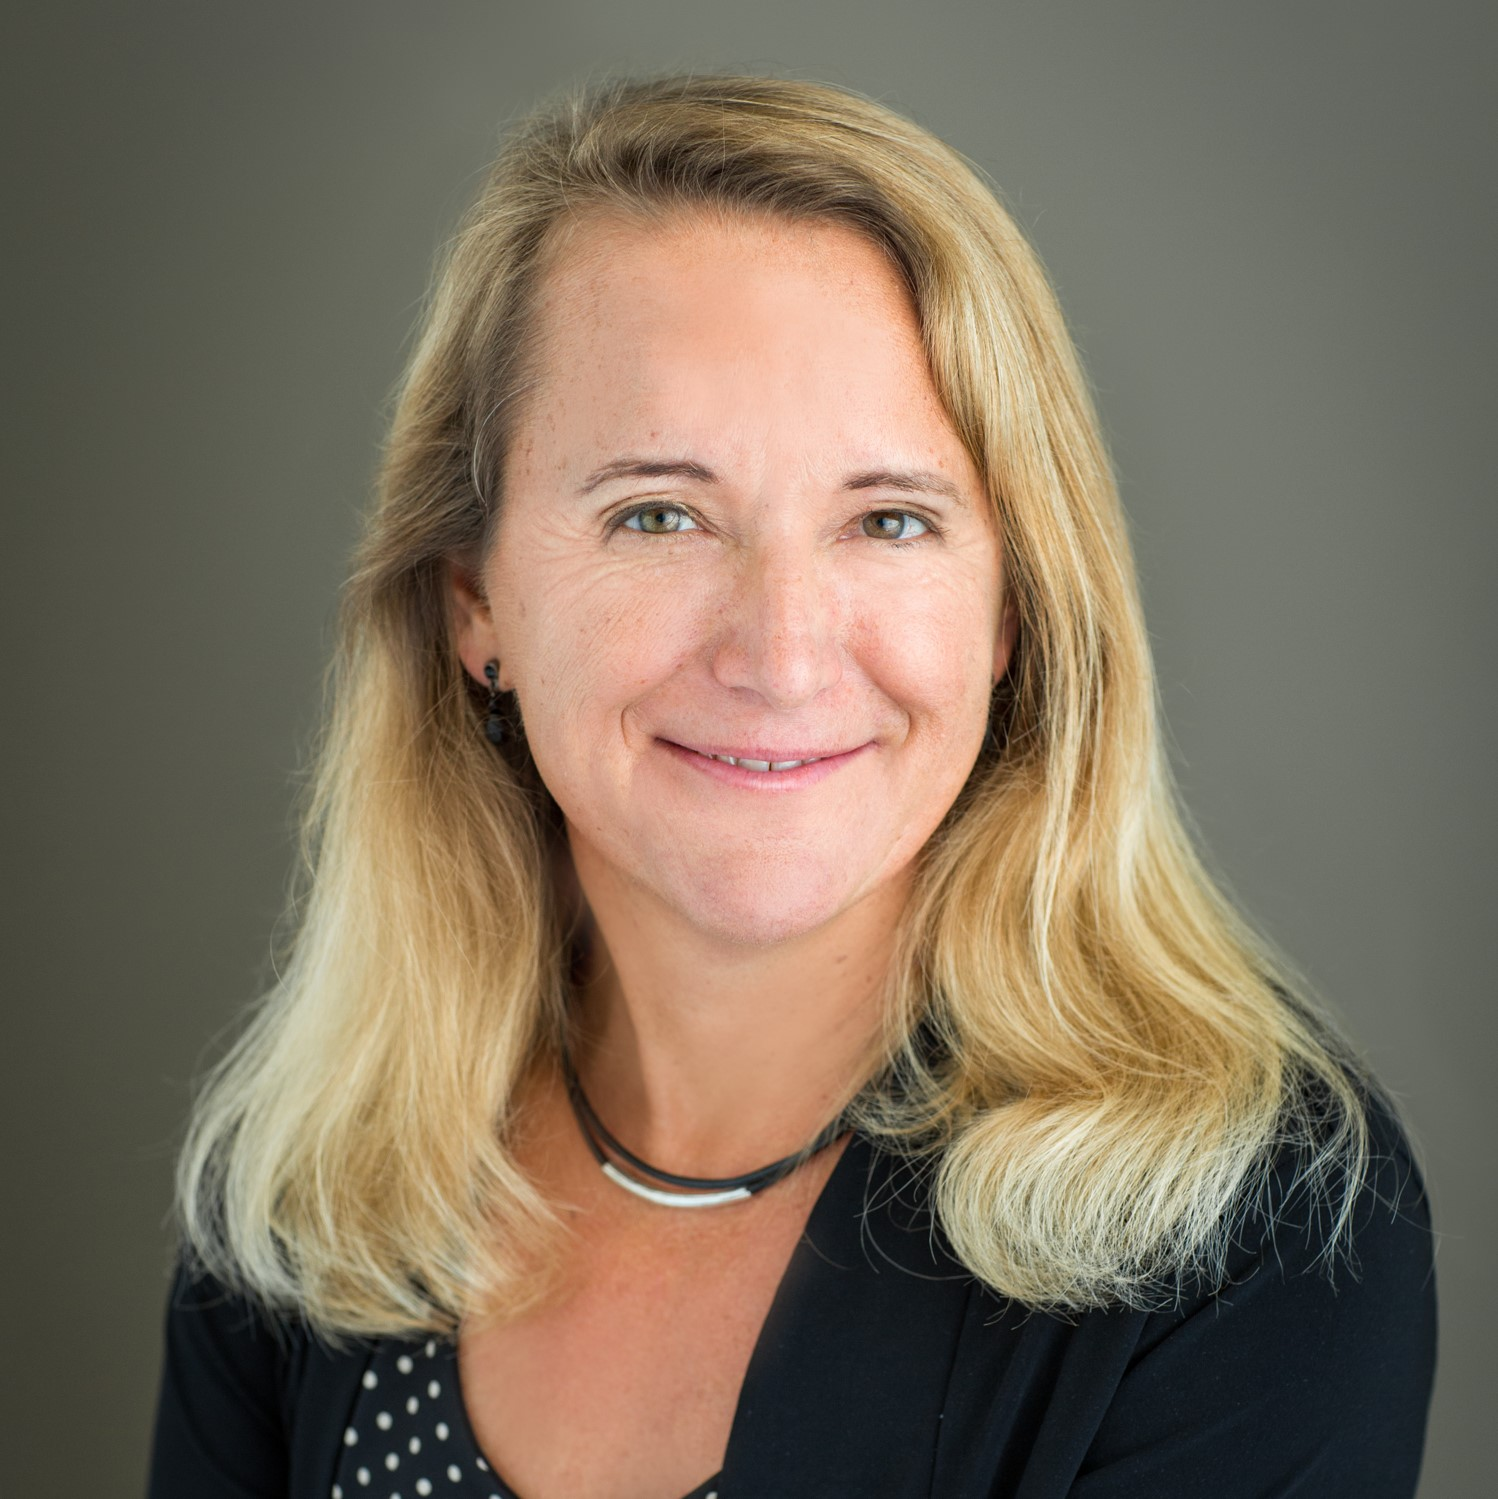 Professor Lise Getoor